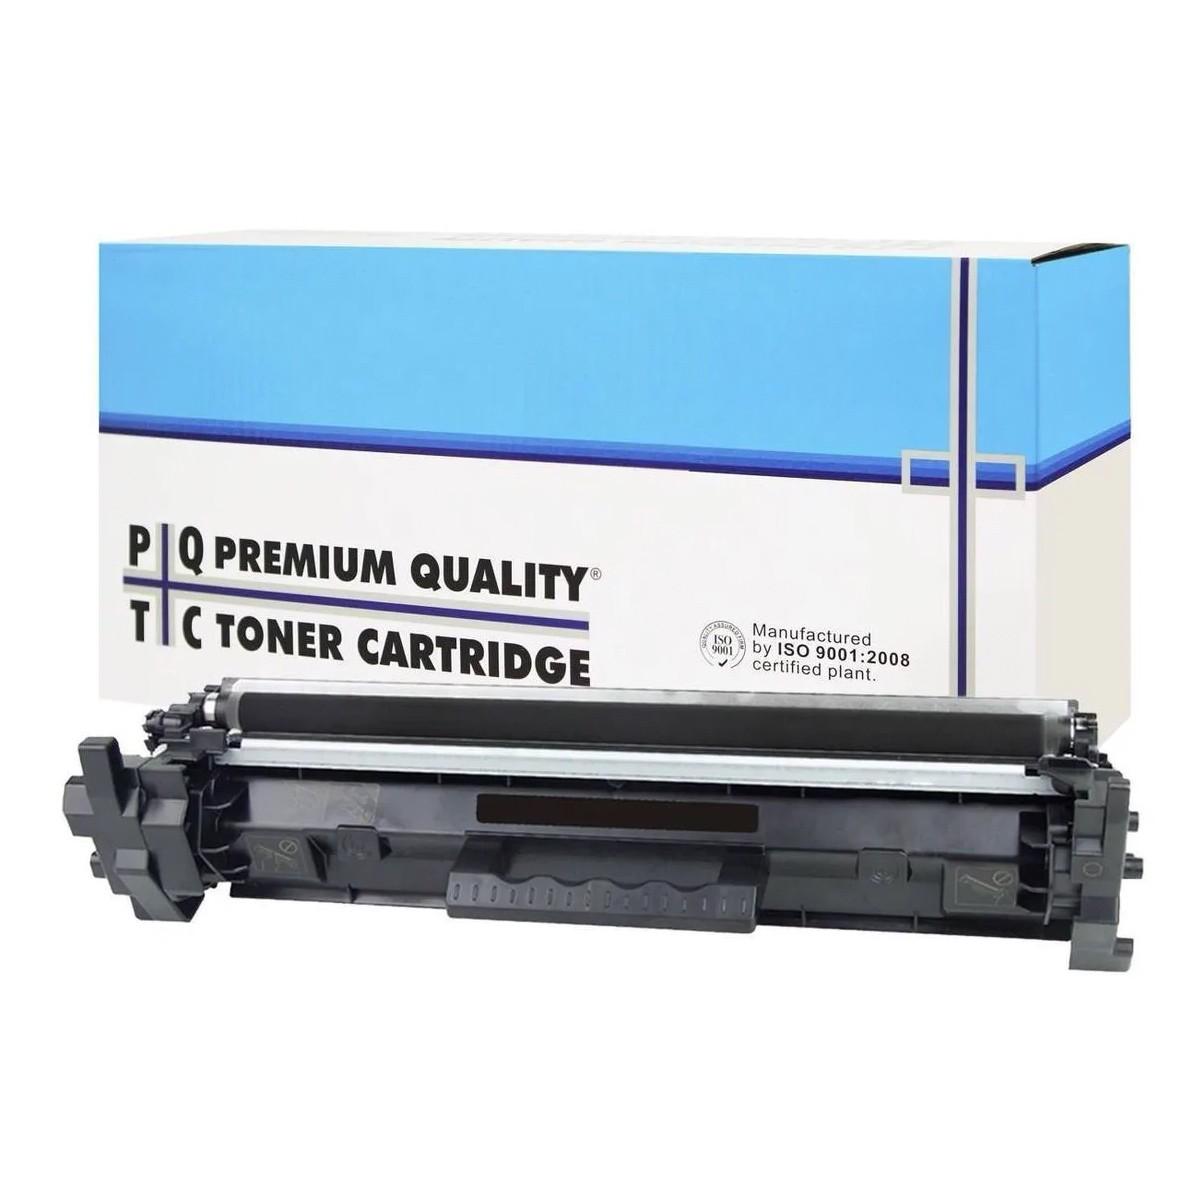 Compativel: Toner Premium Quality para HP CF217A CF217 17A COM CHIP m102 m102A m102W m130 m130FW m130A m130nw m130fn